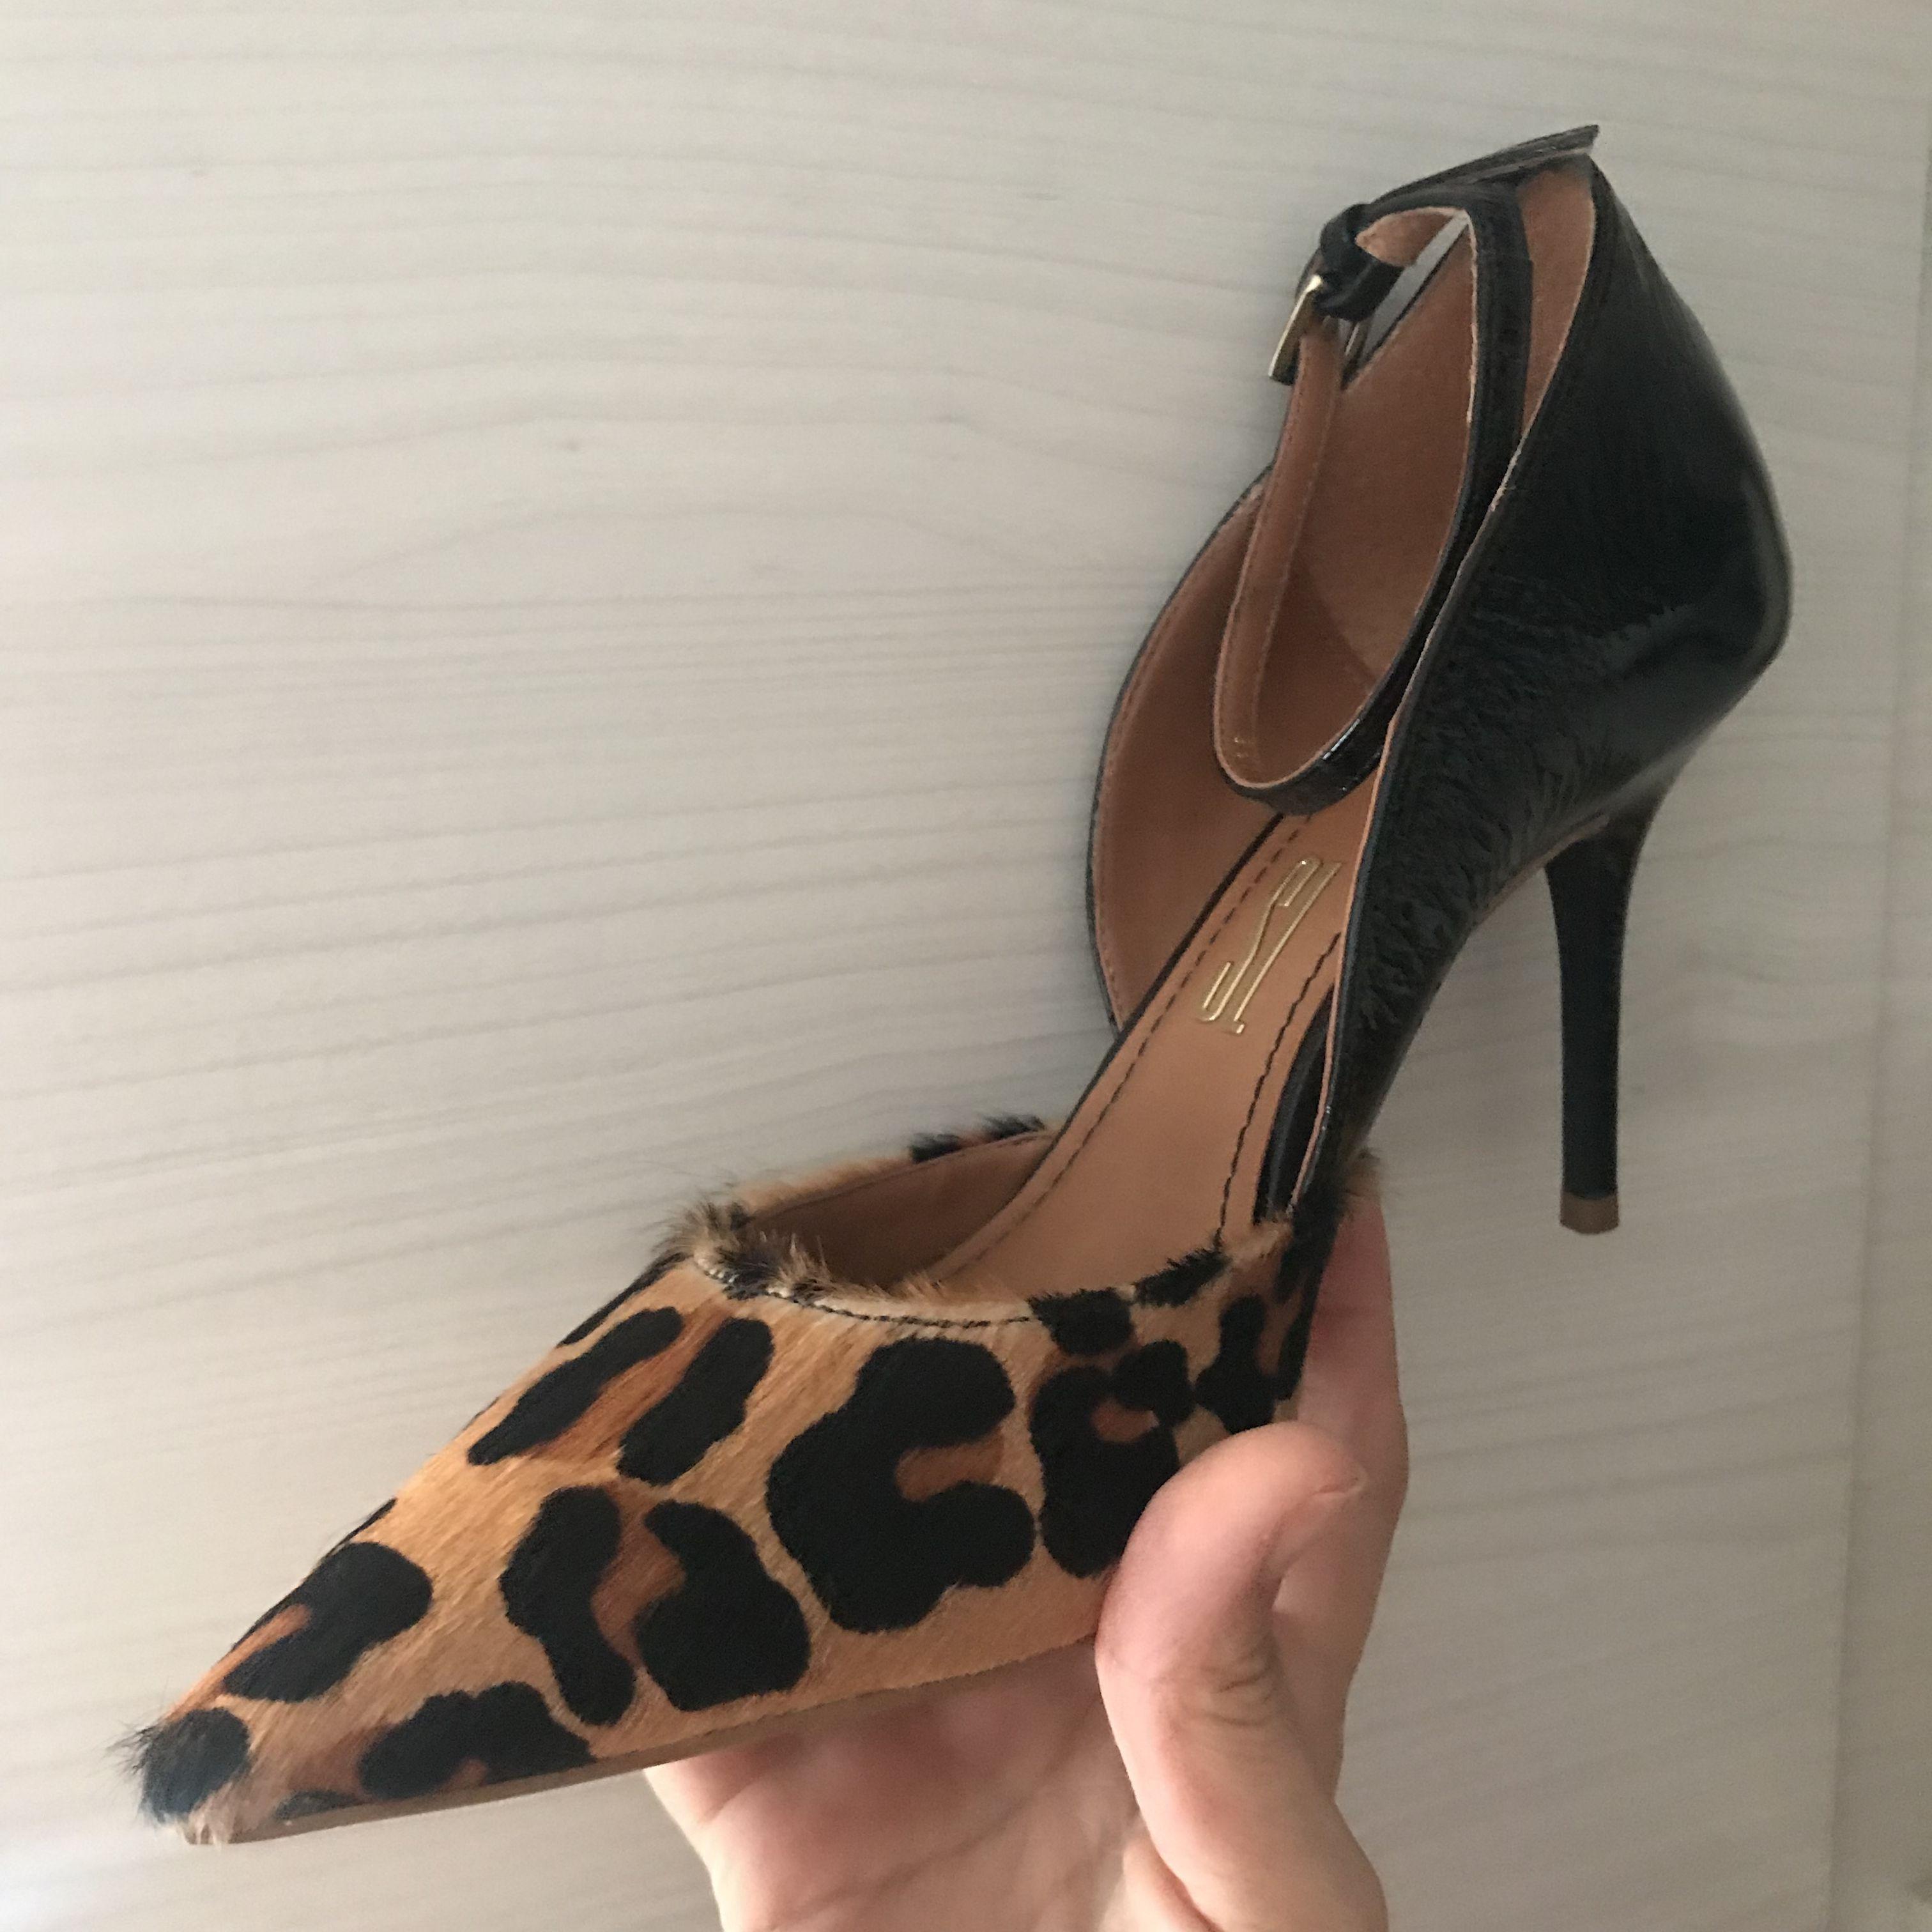 Pin By Elisabetta25873 On Moda Heels Shoes Fashion Classy